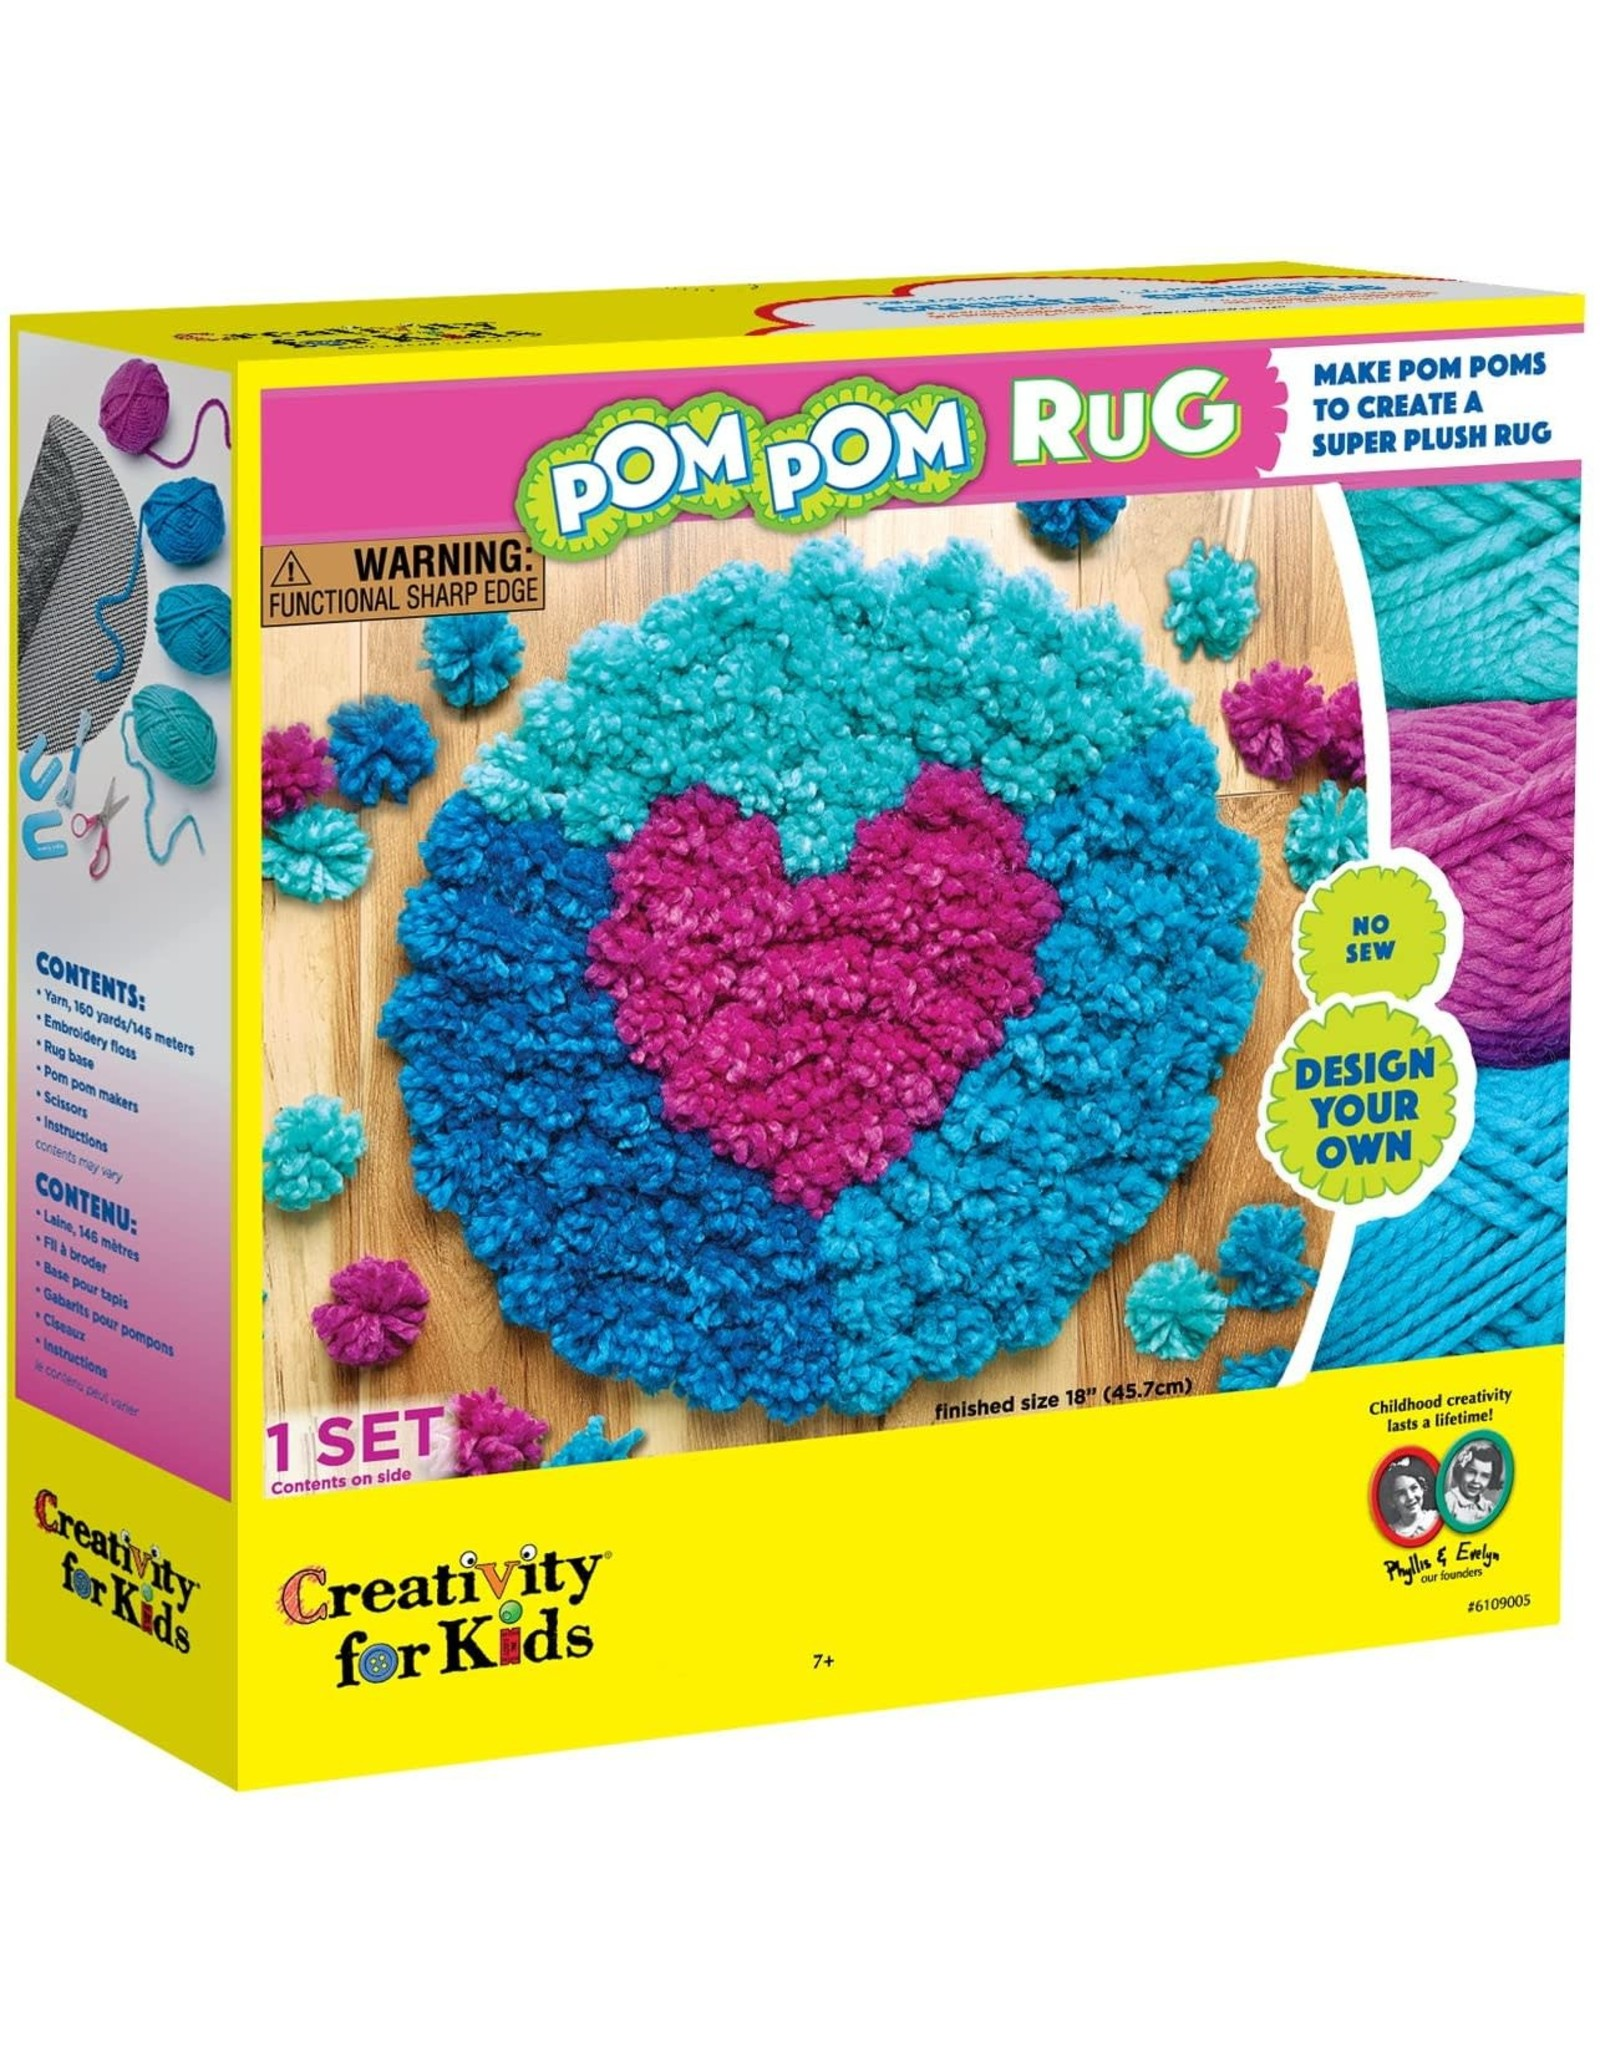 Creativity For Kids Pom Pom Rug